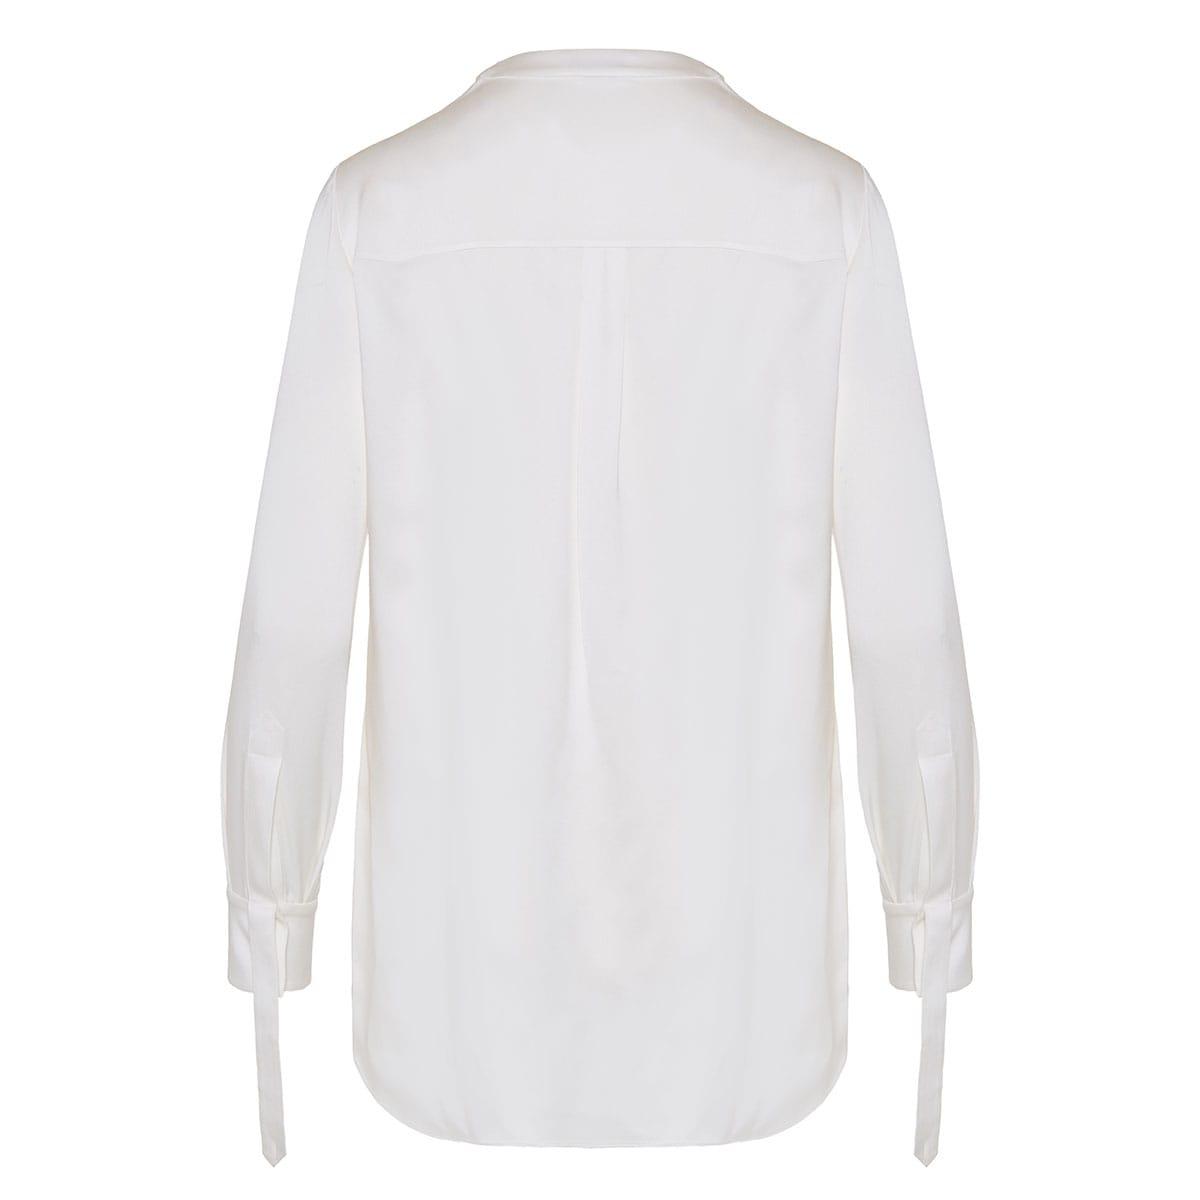 Bow-tie silk shirt